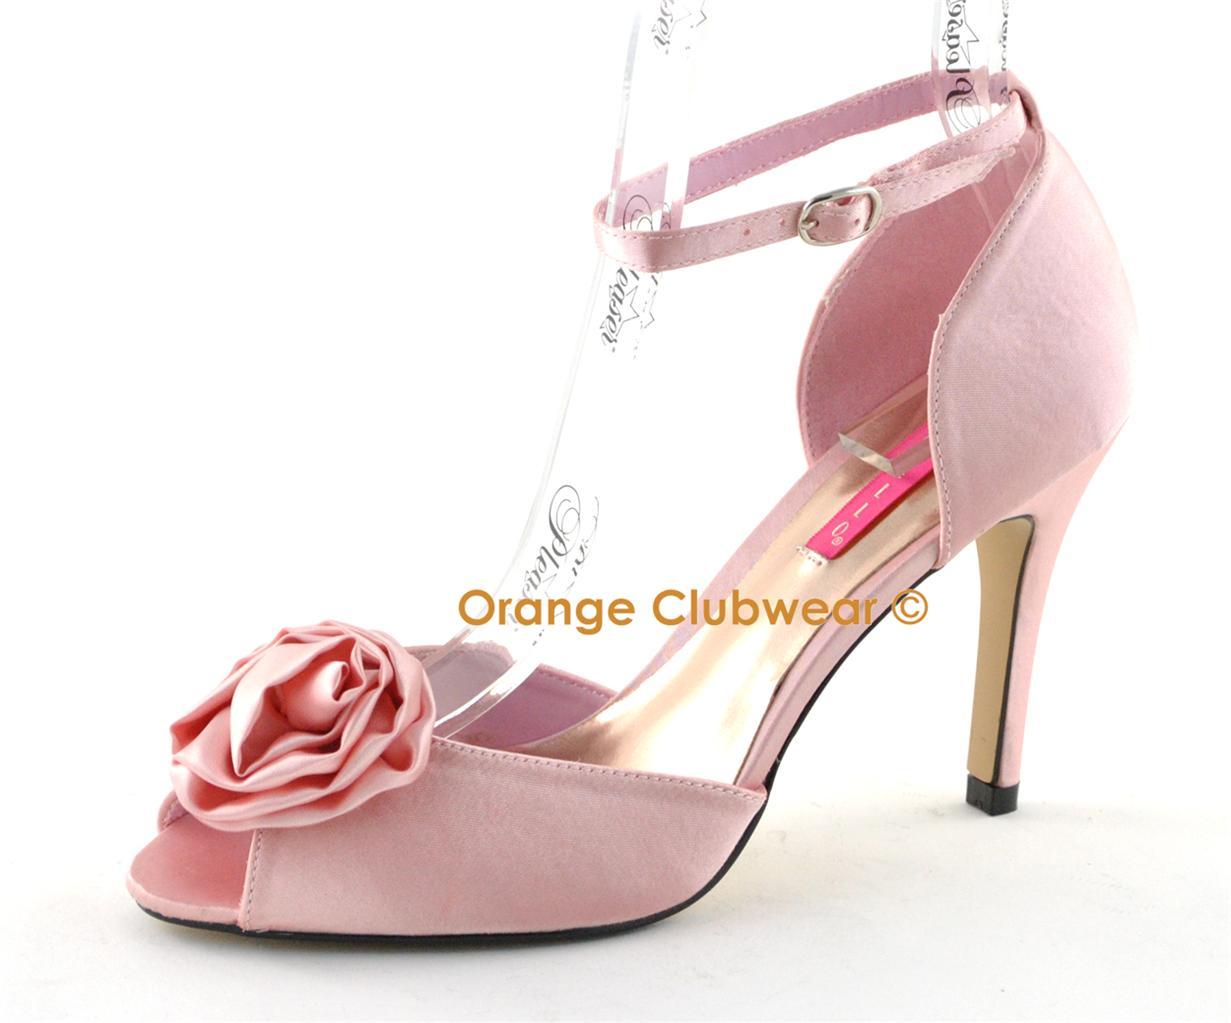 bordello rosa 02 pink satin women 39 s high heels shoes ebay. Black Bedroom Furniture Sets. Home Design Ideas